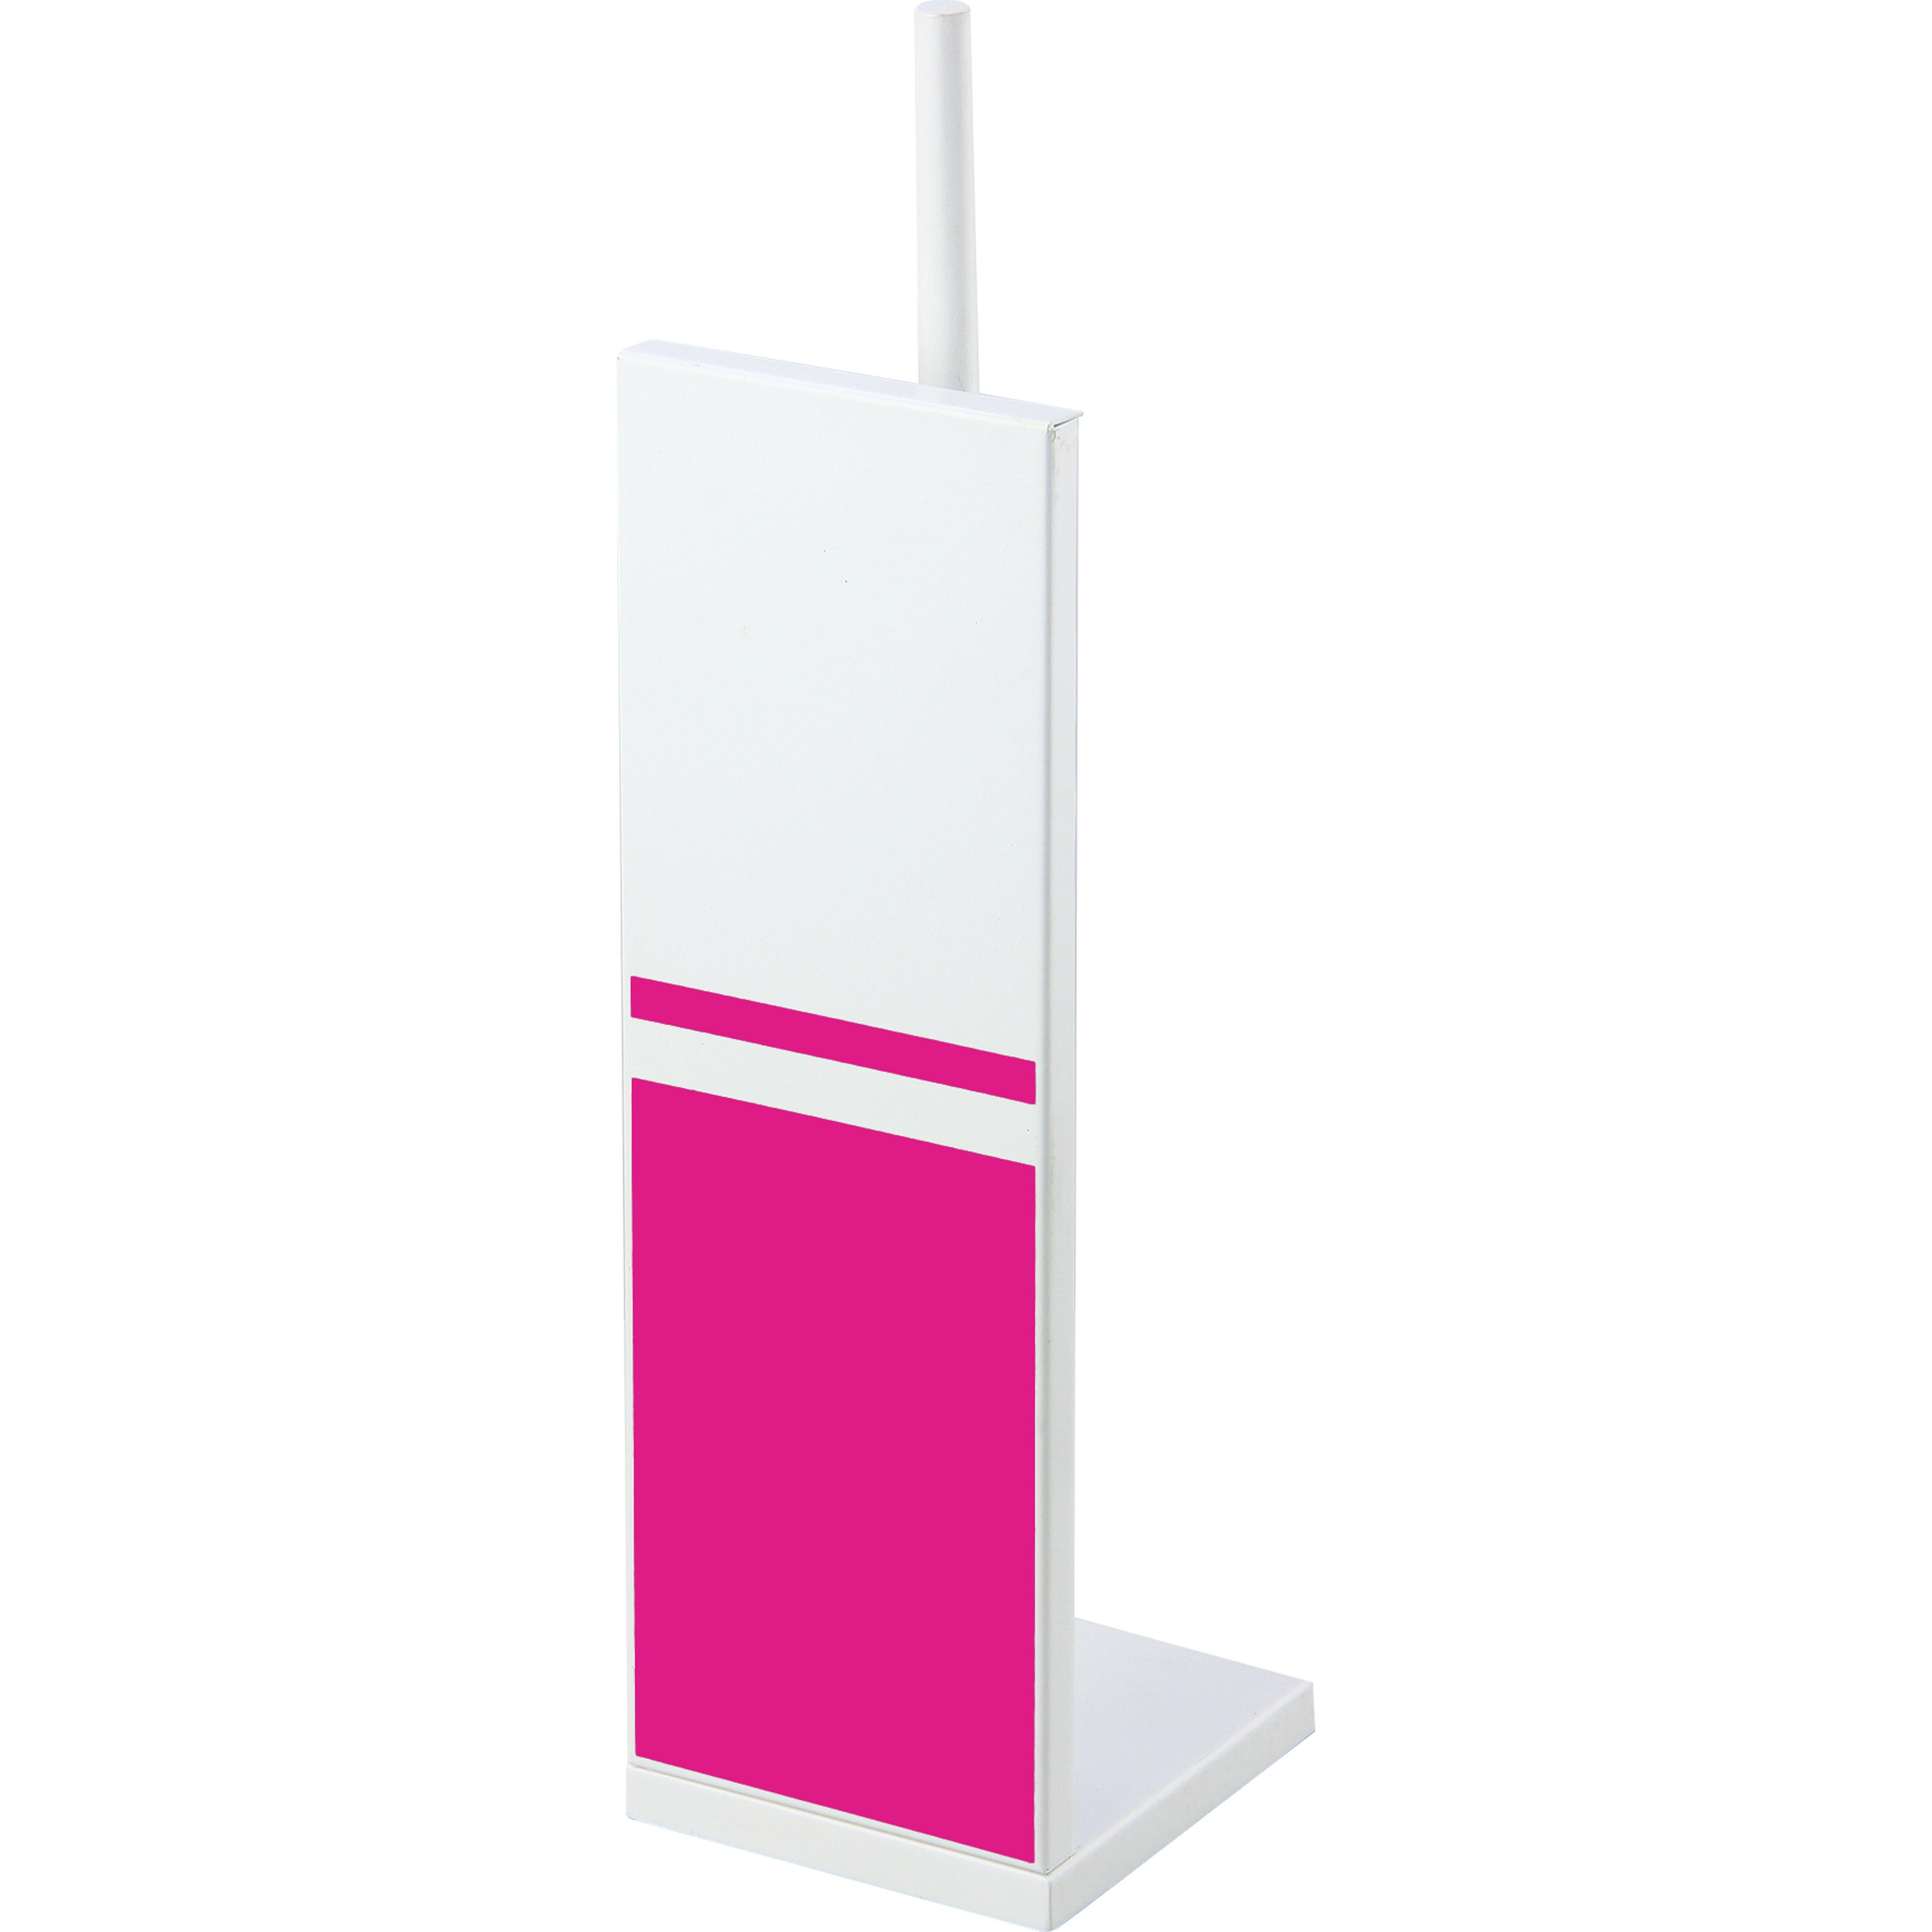 Evideco Freestanding Toilet Tissue Roll Storage Holder